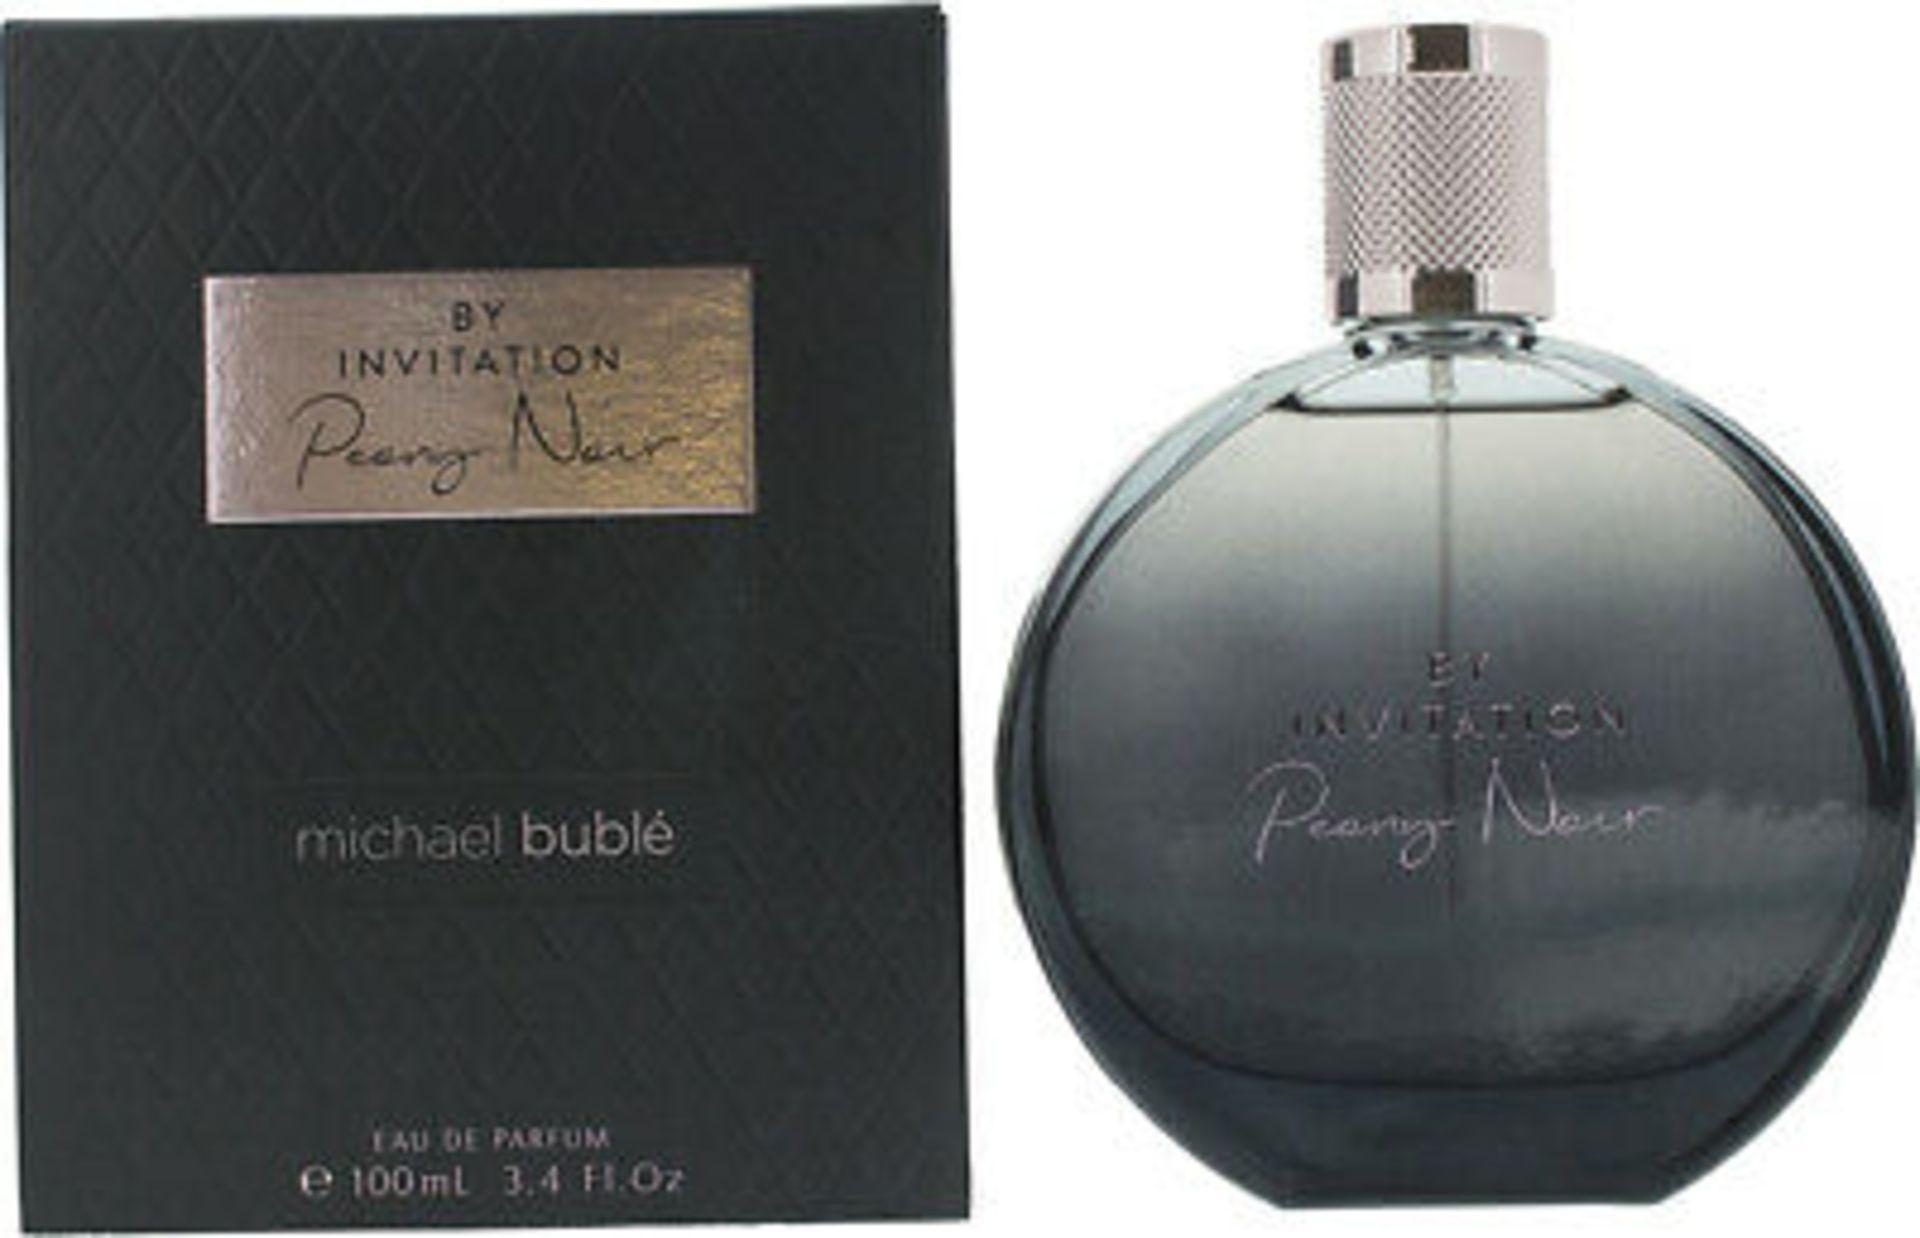 + VAT Brand New Michael Buble By Invitation Peony Noir 100ml EDP